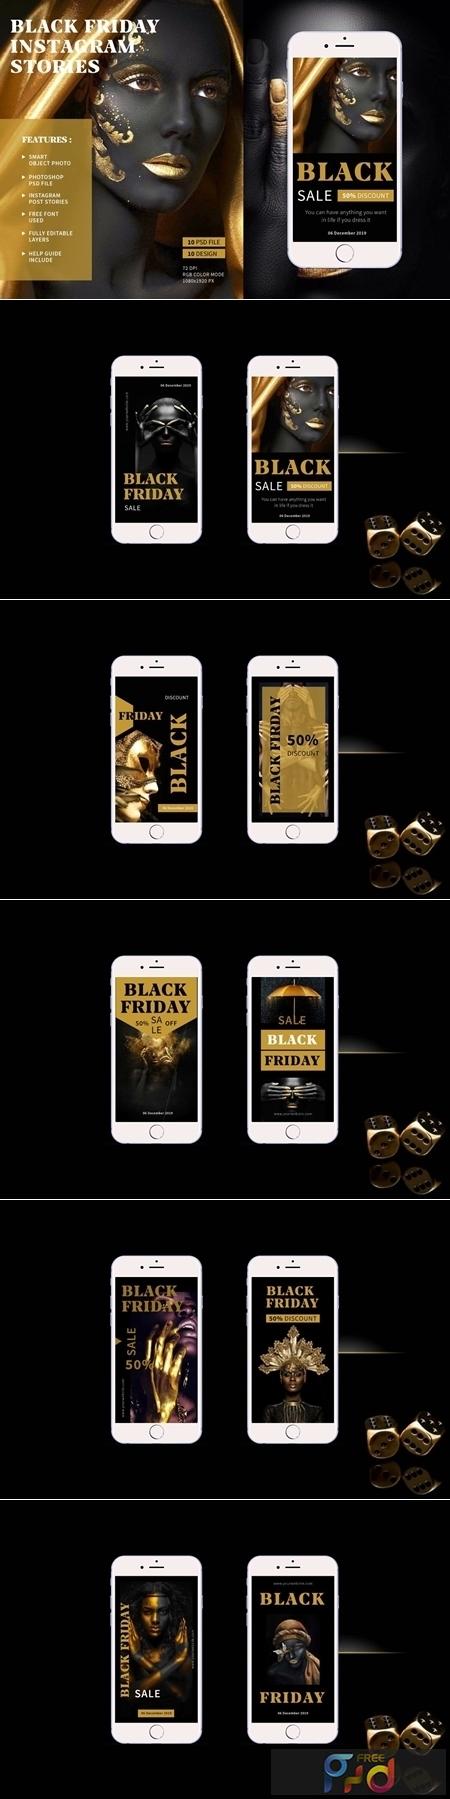 Black Friday - Instagram Stories 4244560 1